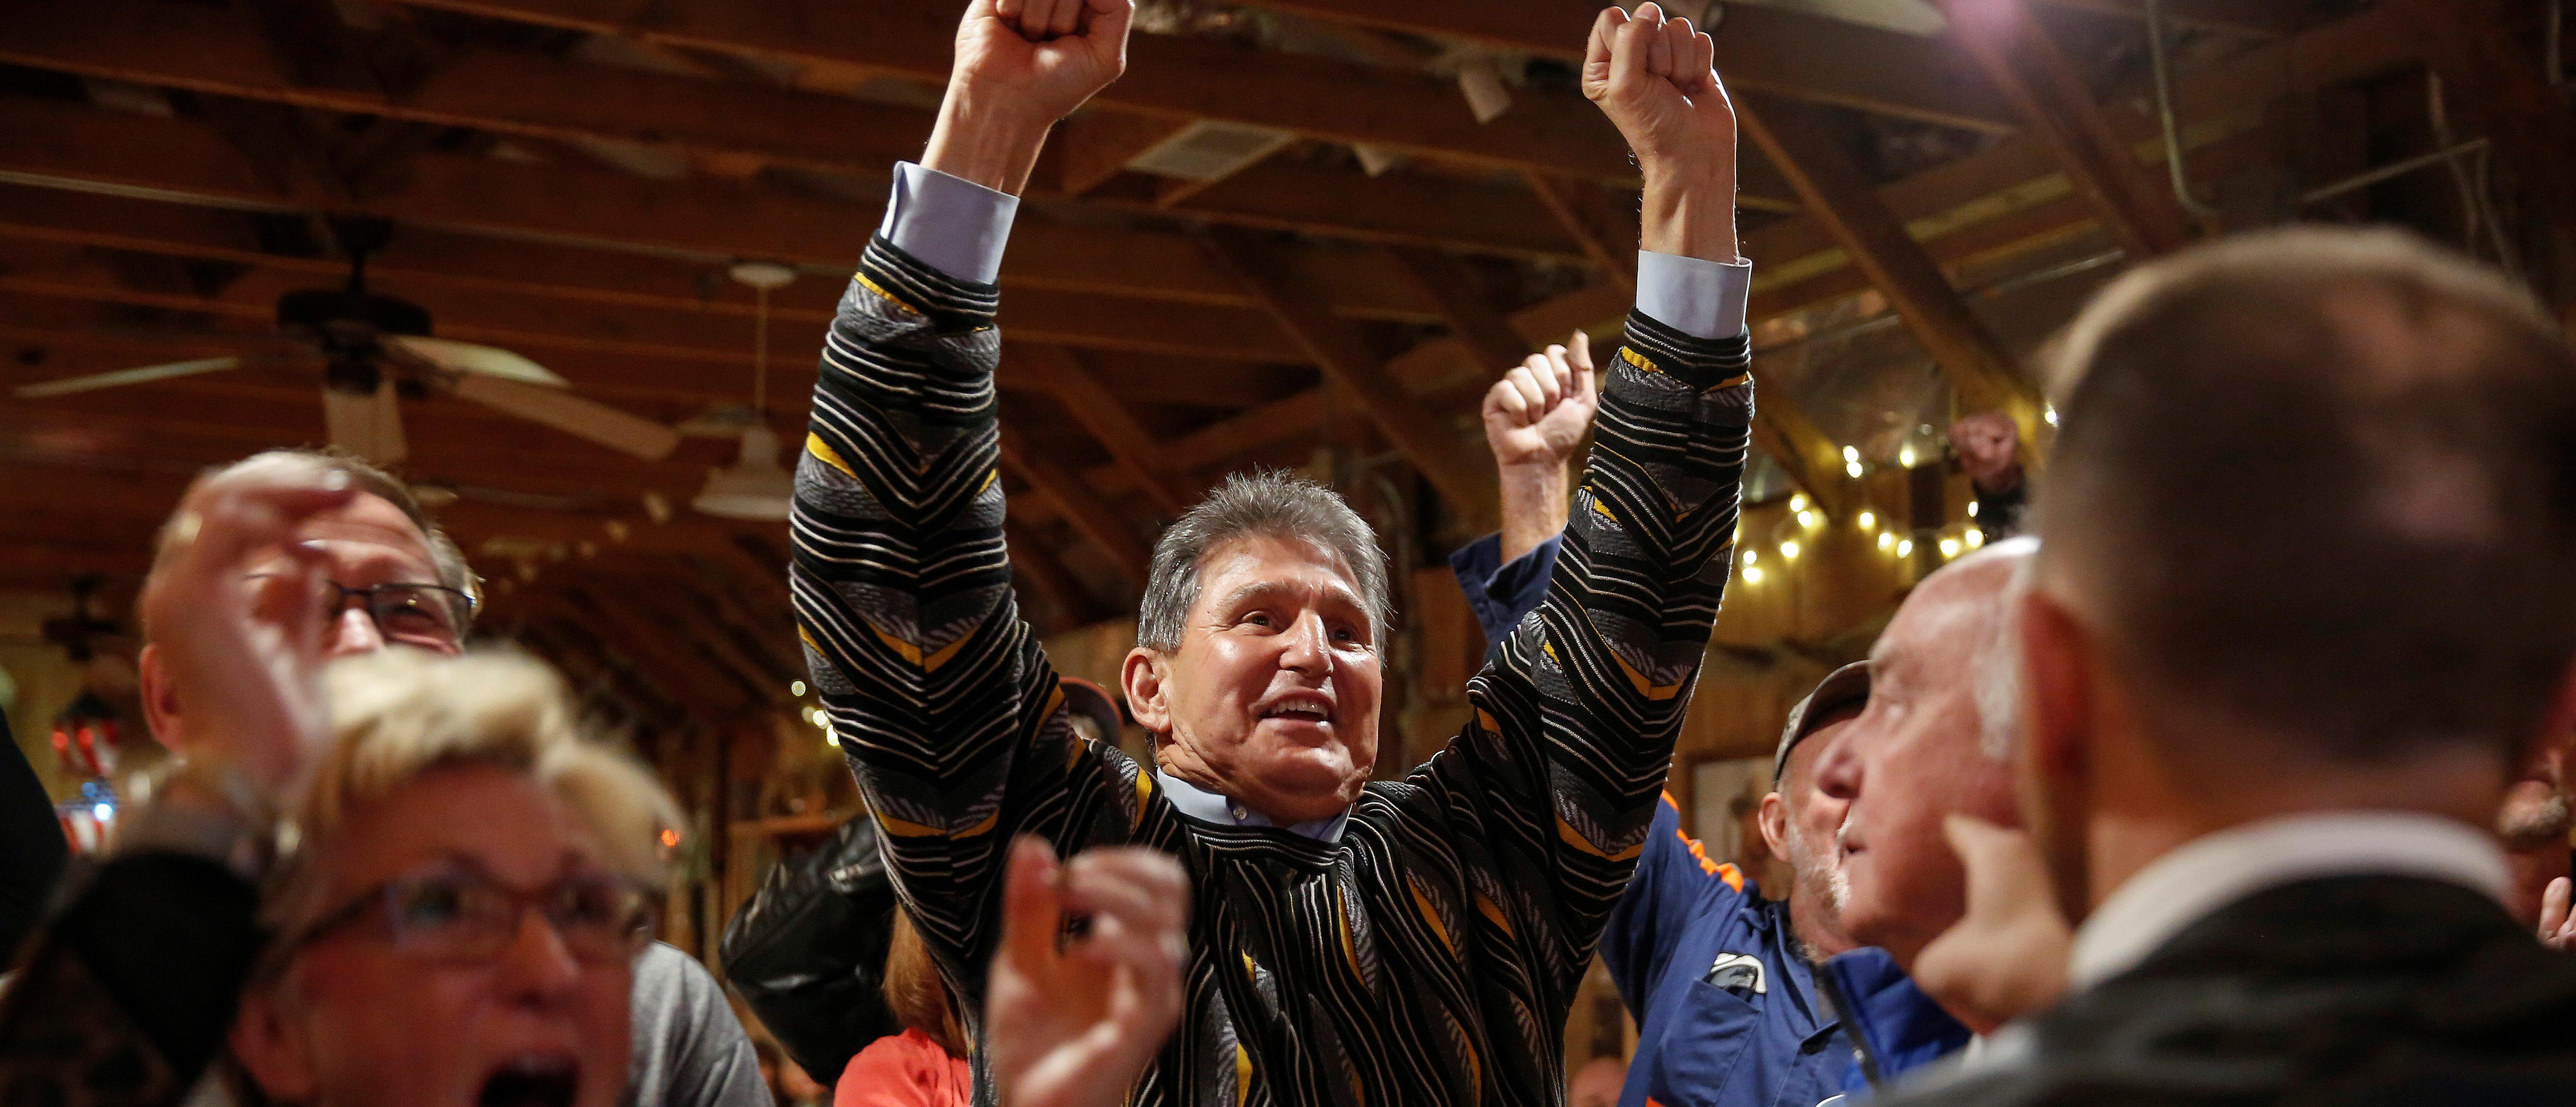 Senator Joe Manchin (D-WV) celebrates West Virginia University's victory over Texas University in football, ahead of 2018 midterm elections, at Hound Dog Adkins Barn in Peach Creek, West Virginia, U.S., November 3, 2018. REUTERS/Joshua Roberts